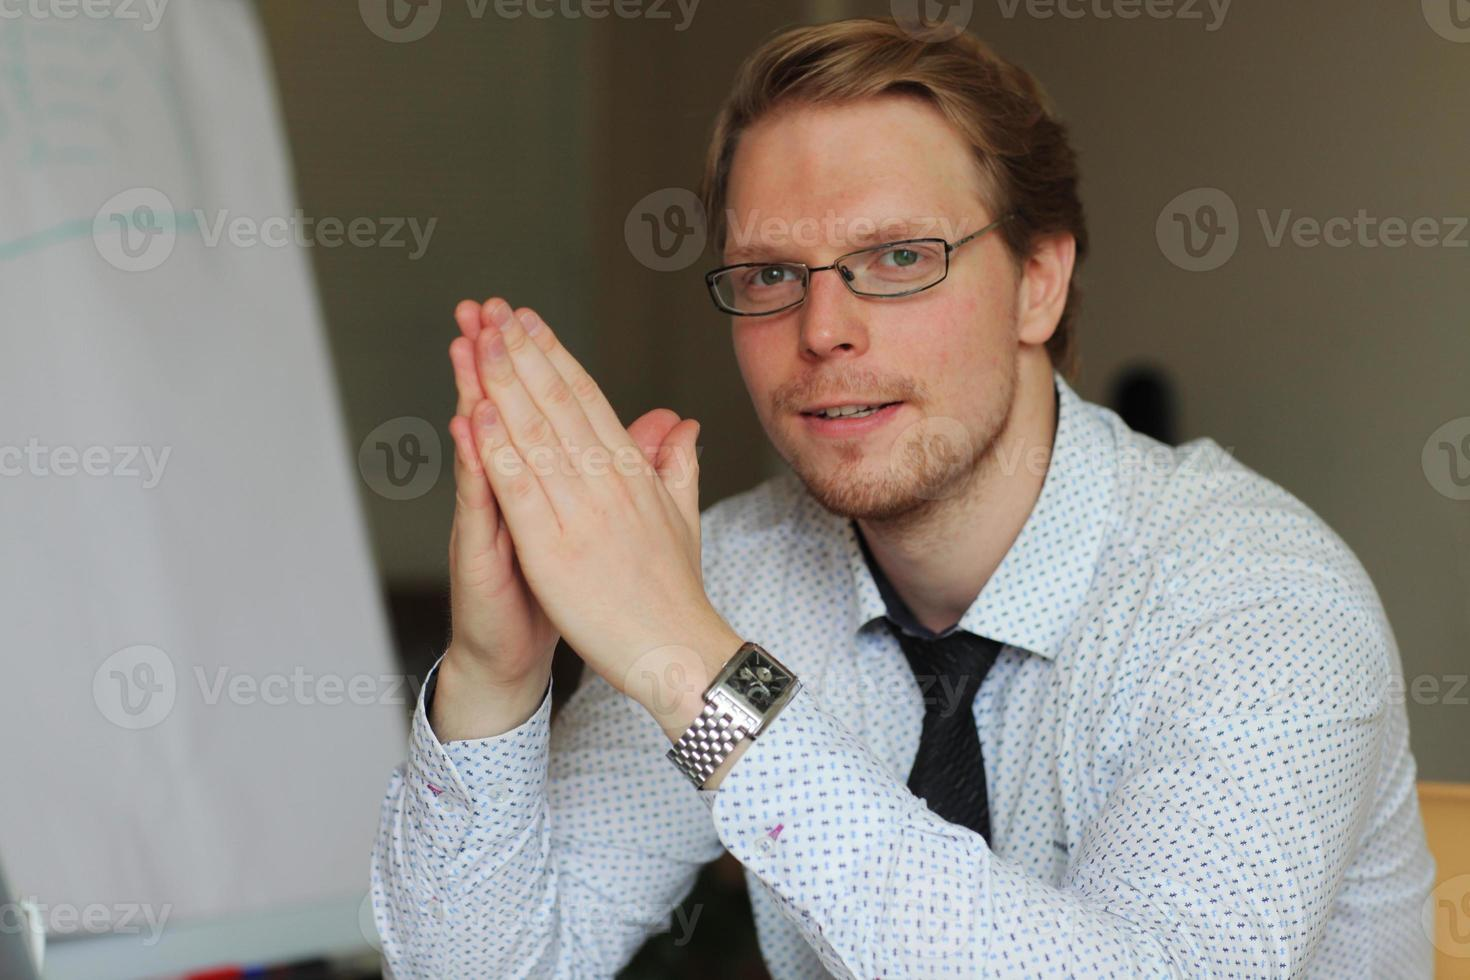 Business man managing photo